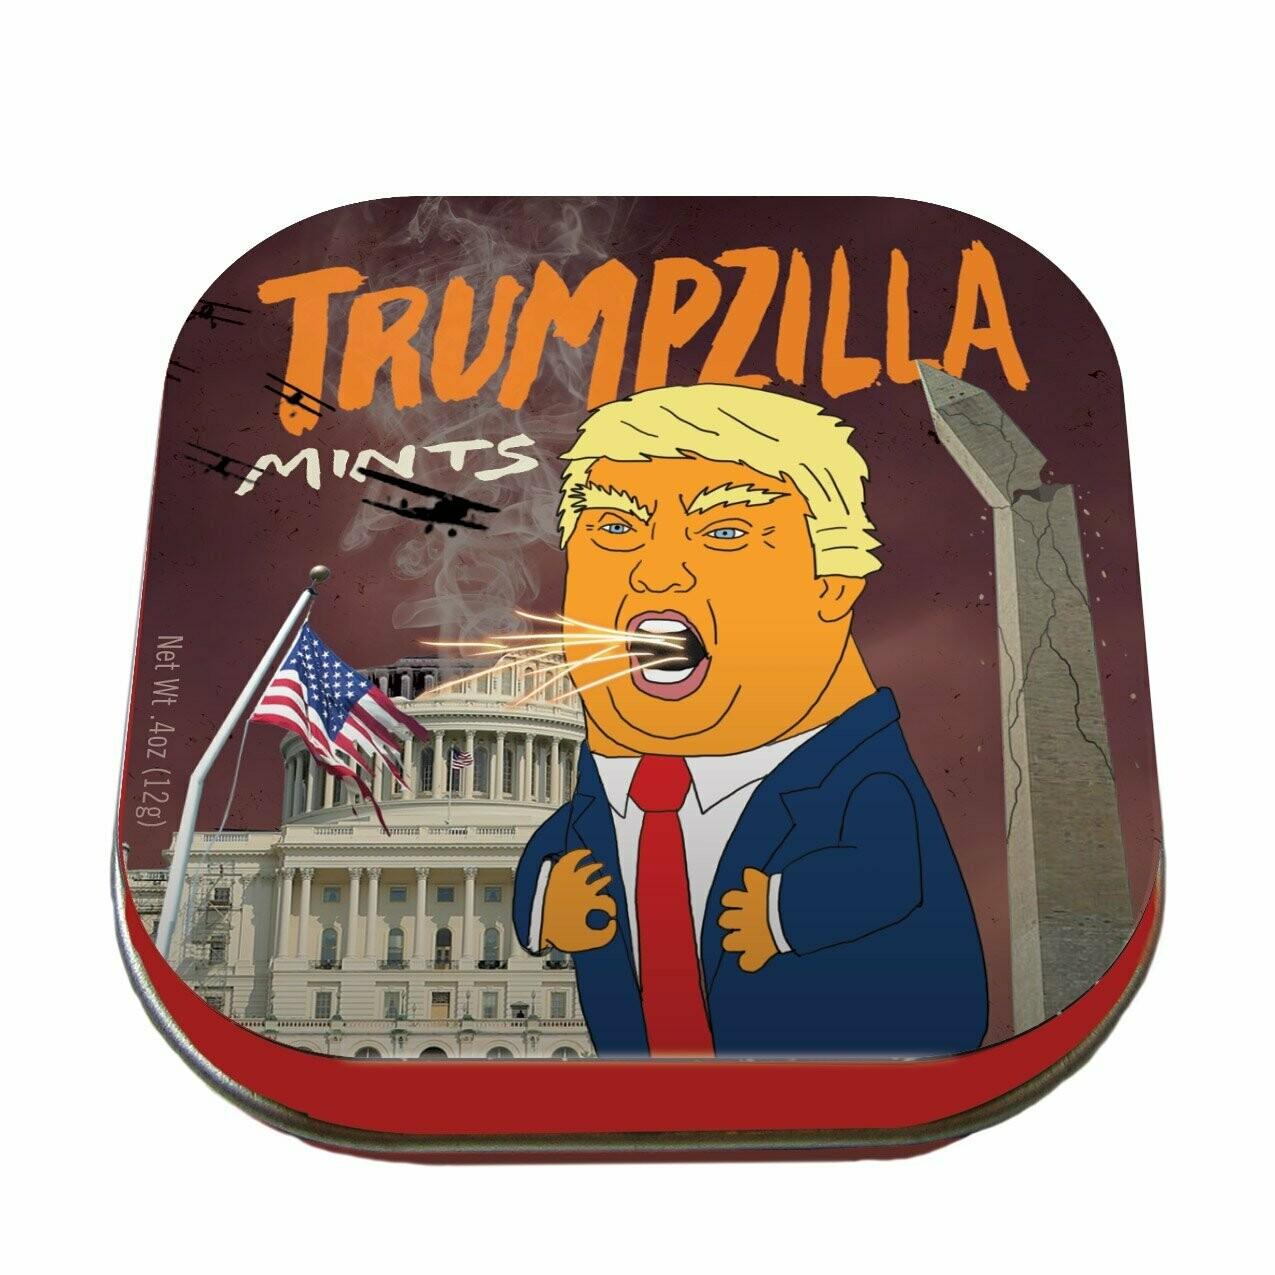 Sale: UPG Trumpzilla Mints - orig 3.50